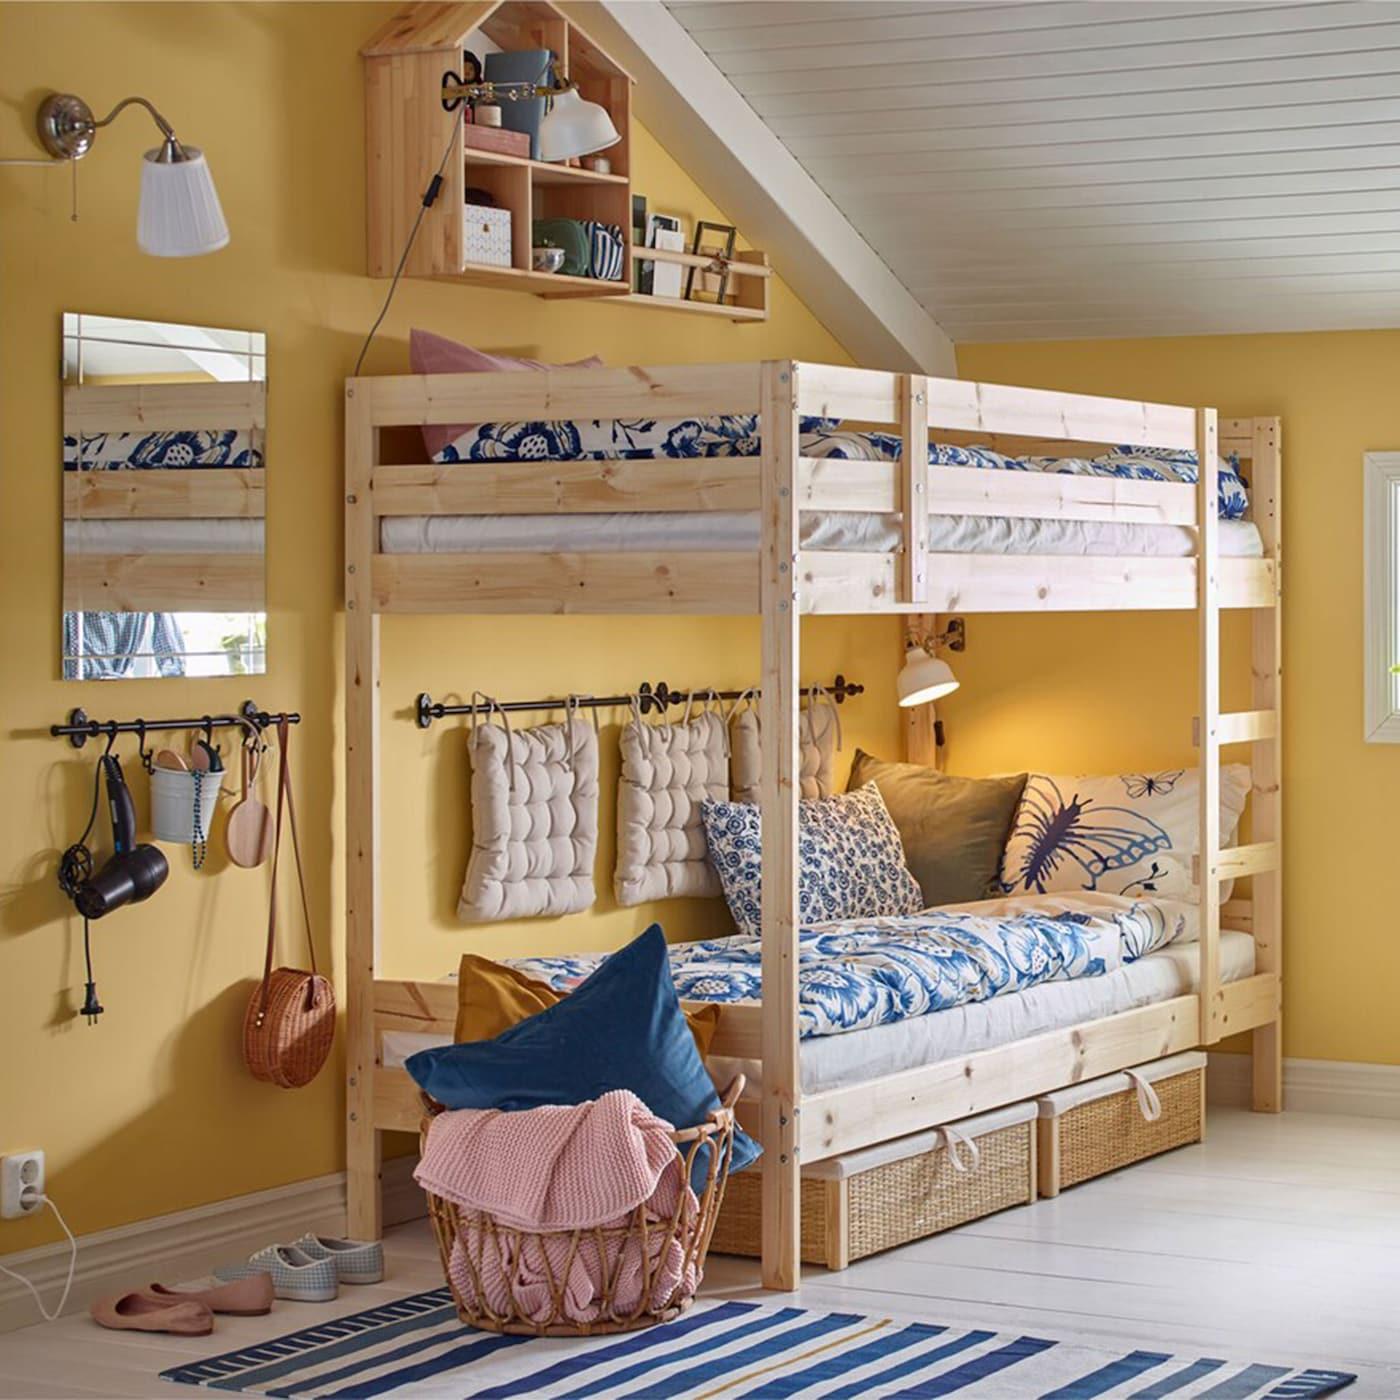 Ikea Stampe Da Muro https://www.ikea/ch/it/ideas/un-casale-ristrutturato-in